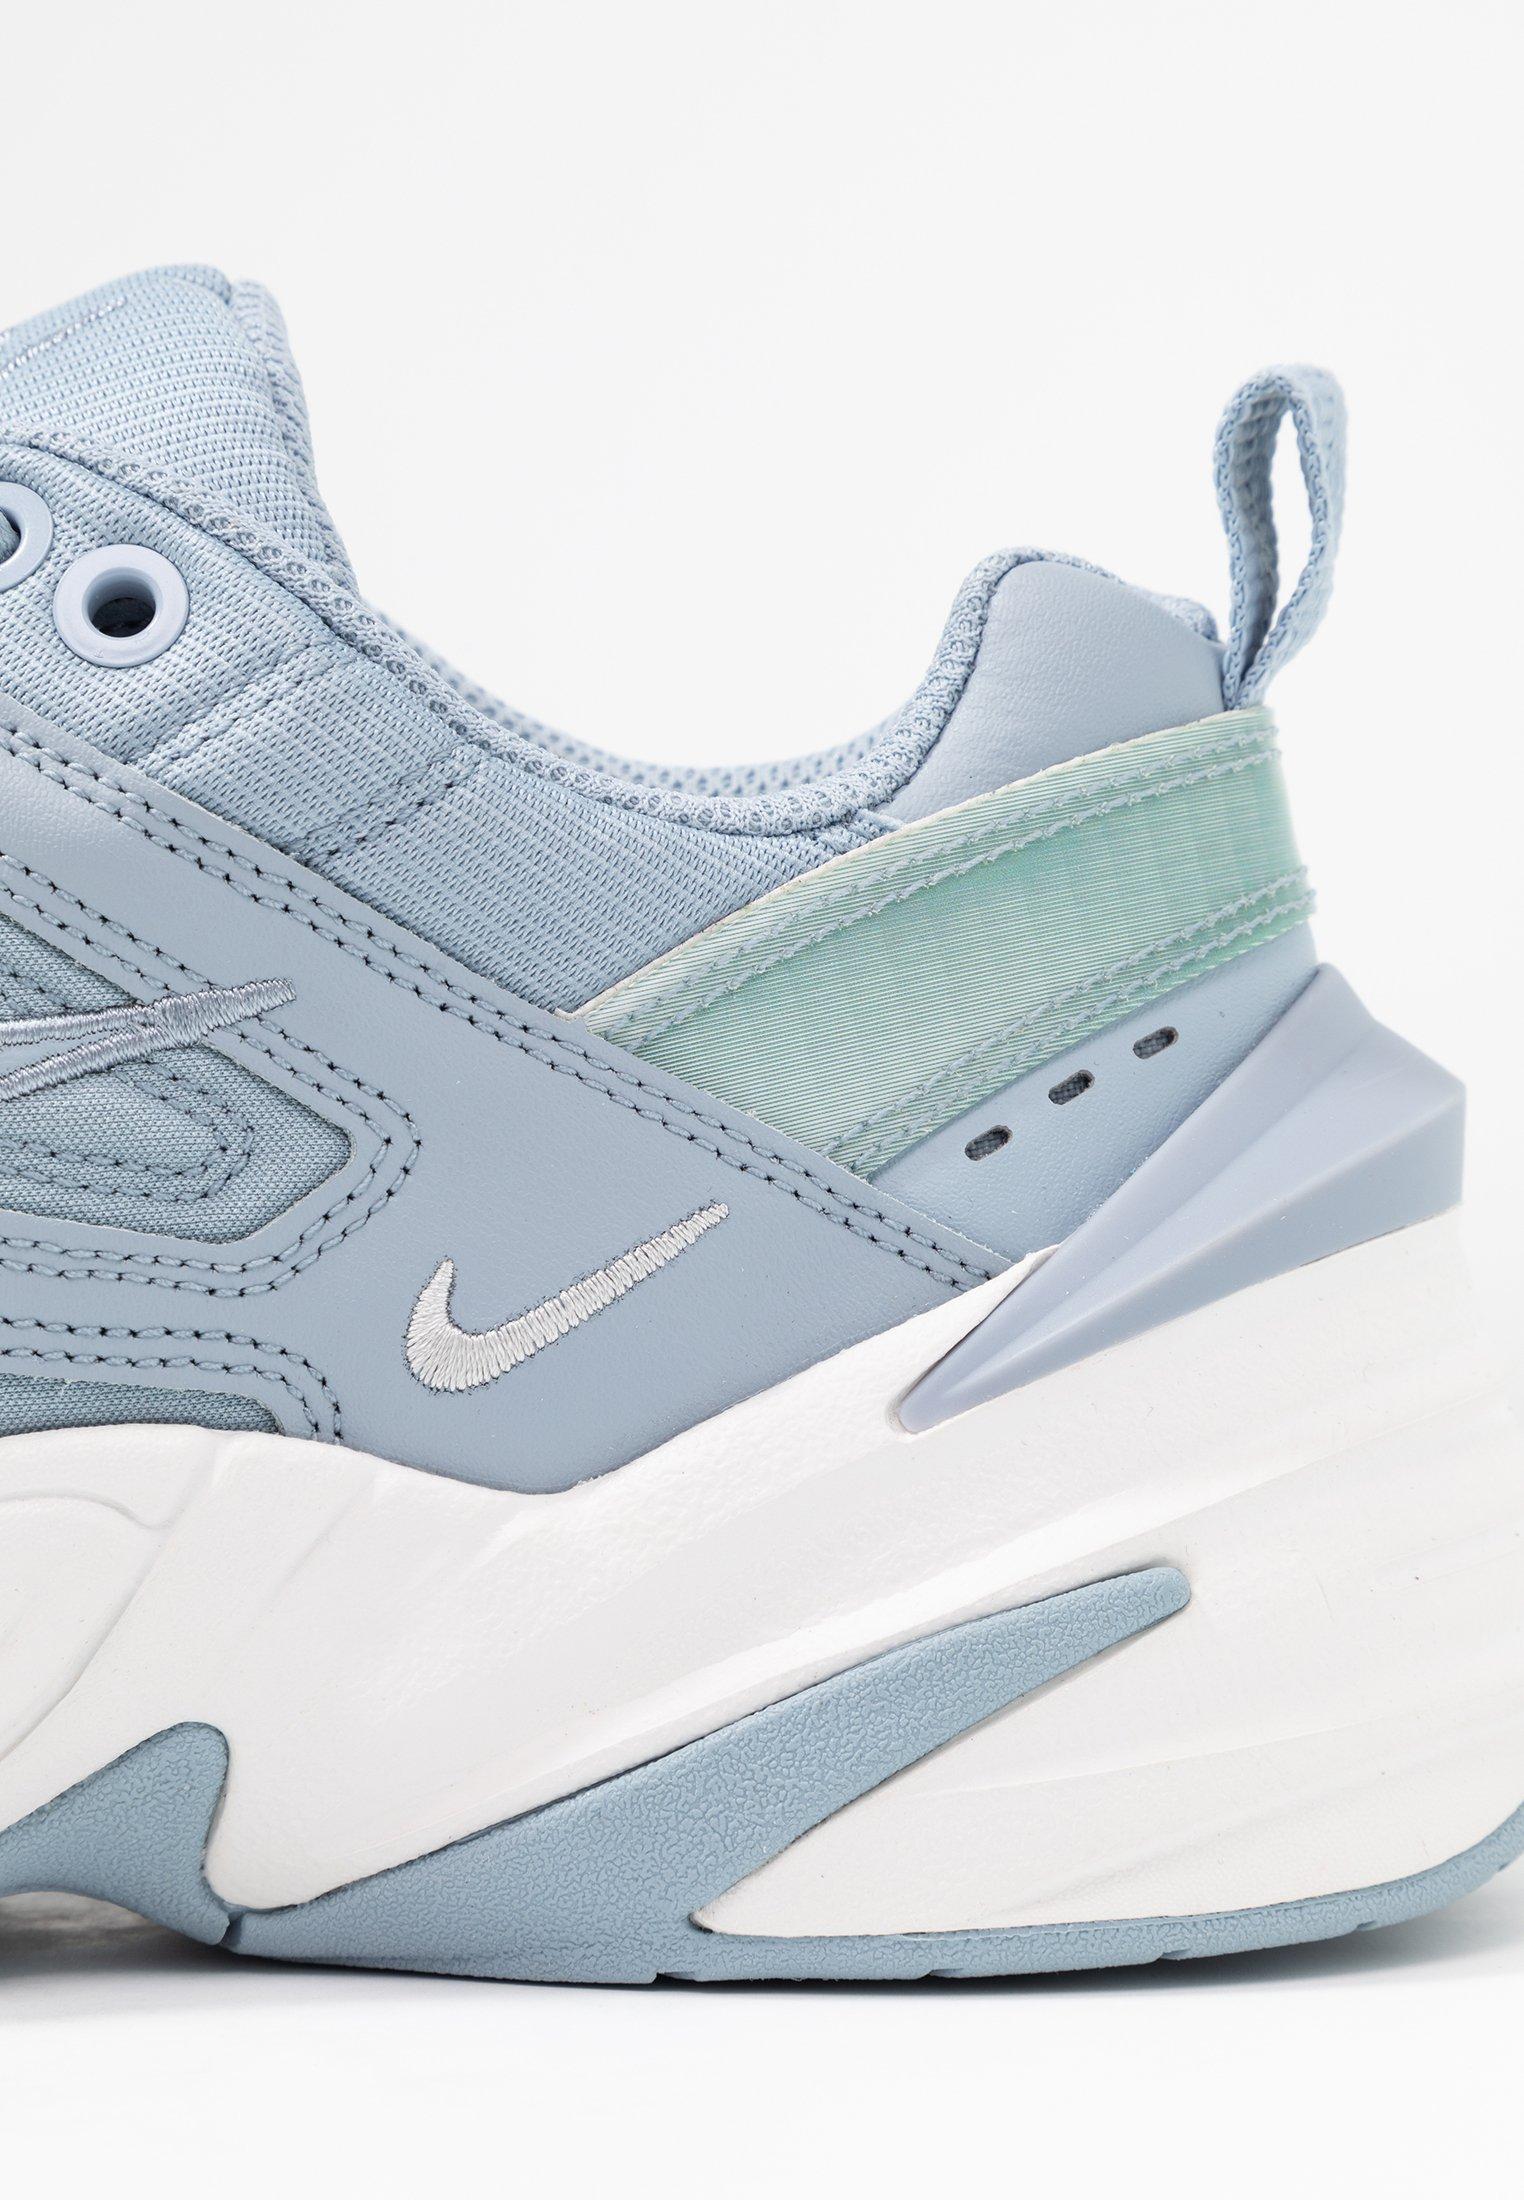 white Sportswear Tint Obsidian platinum Nike TeknoBaskets Basses M2k Mist QtshdCrx